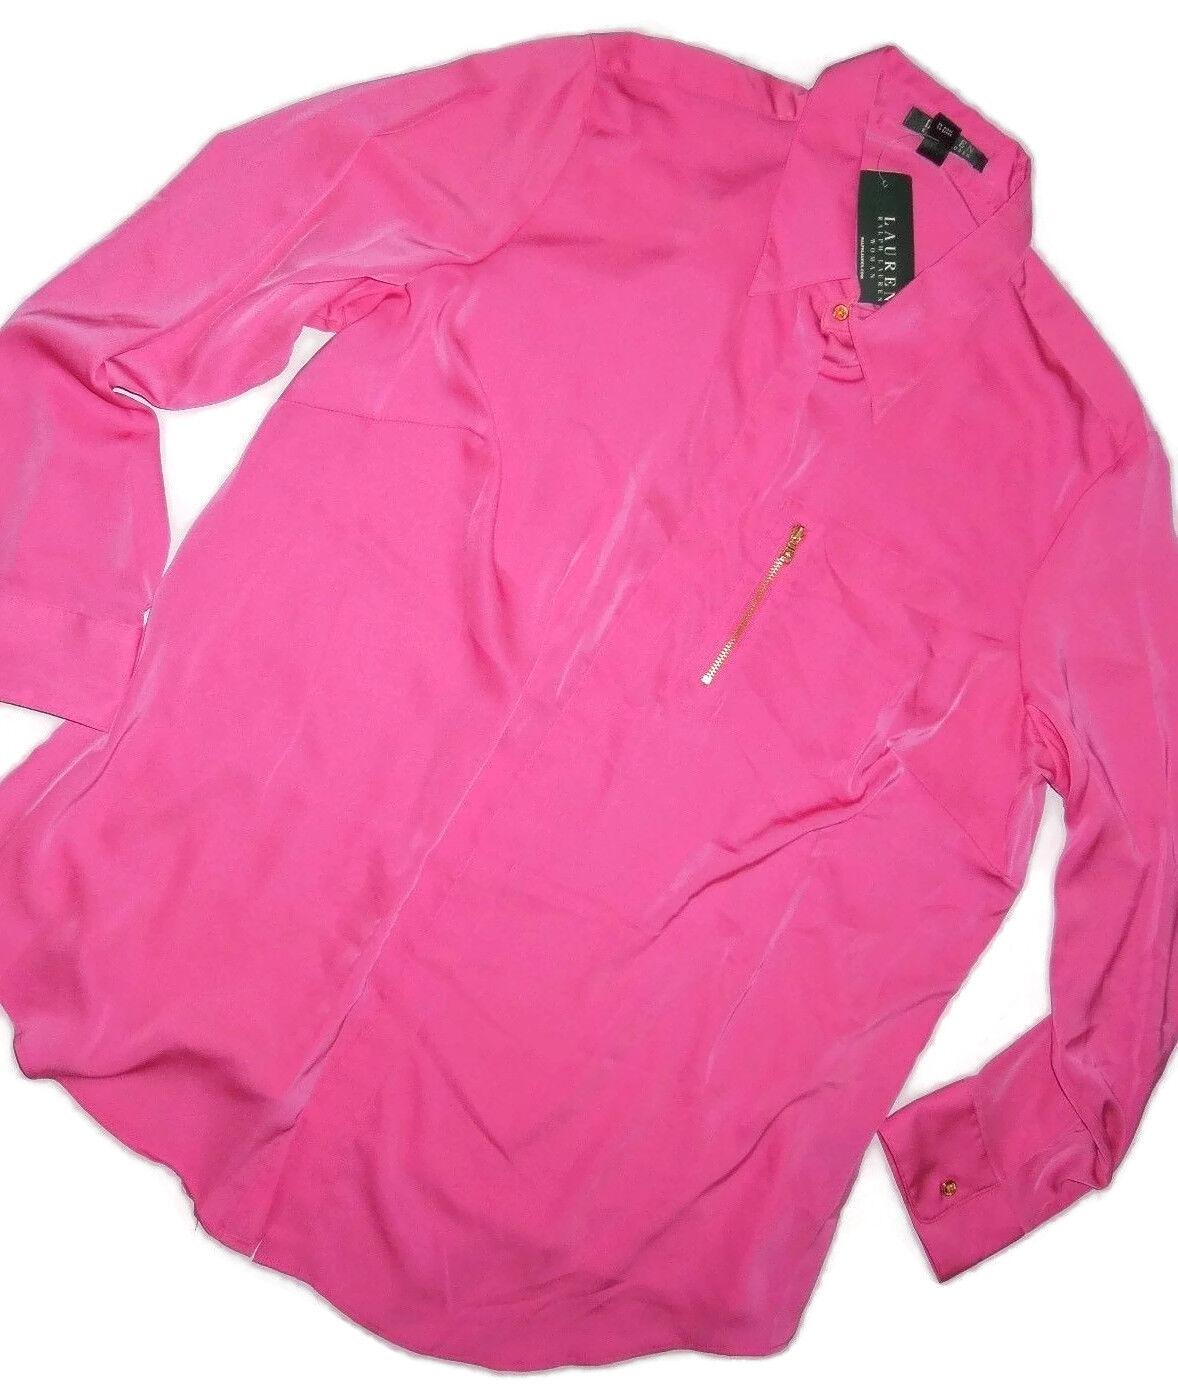 Ralph Lauren Rosa zip pocket long sleeve blouse shirt plus Größe 2X  retail